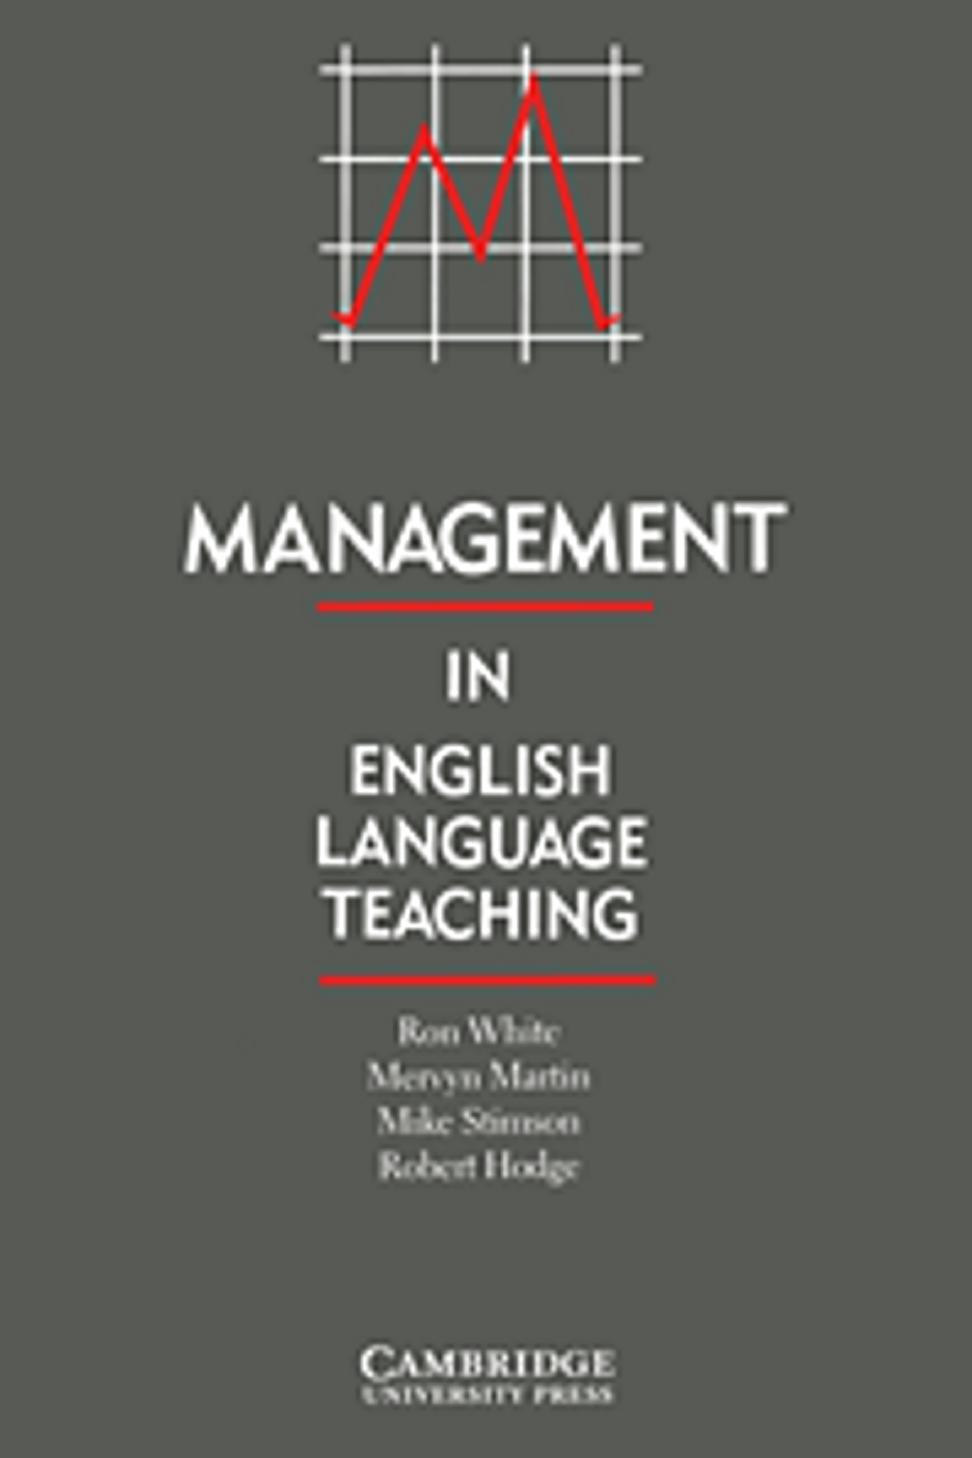 MANAGEMENT IN ENGLISH LANGUAGE TEACHING - Books Language Teachers